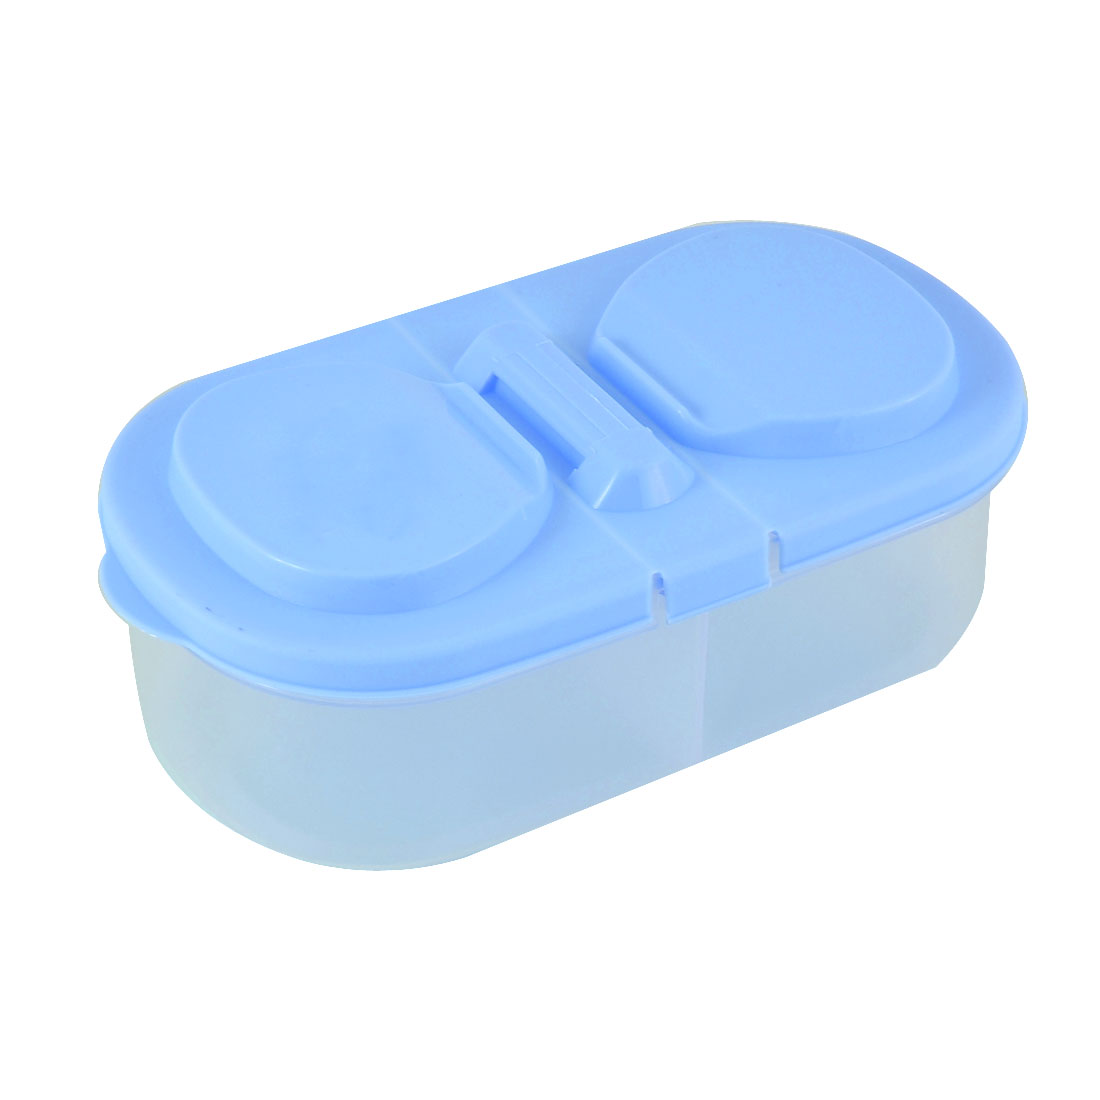 Kitchen Office Refreshing Plastic Case Holder Container Crisper Blue 18cm Long